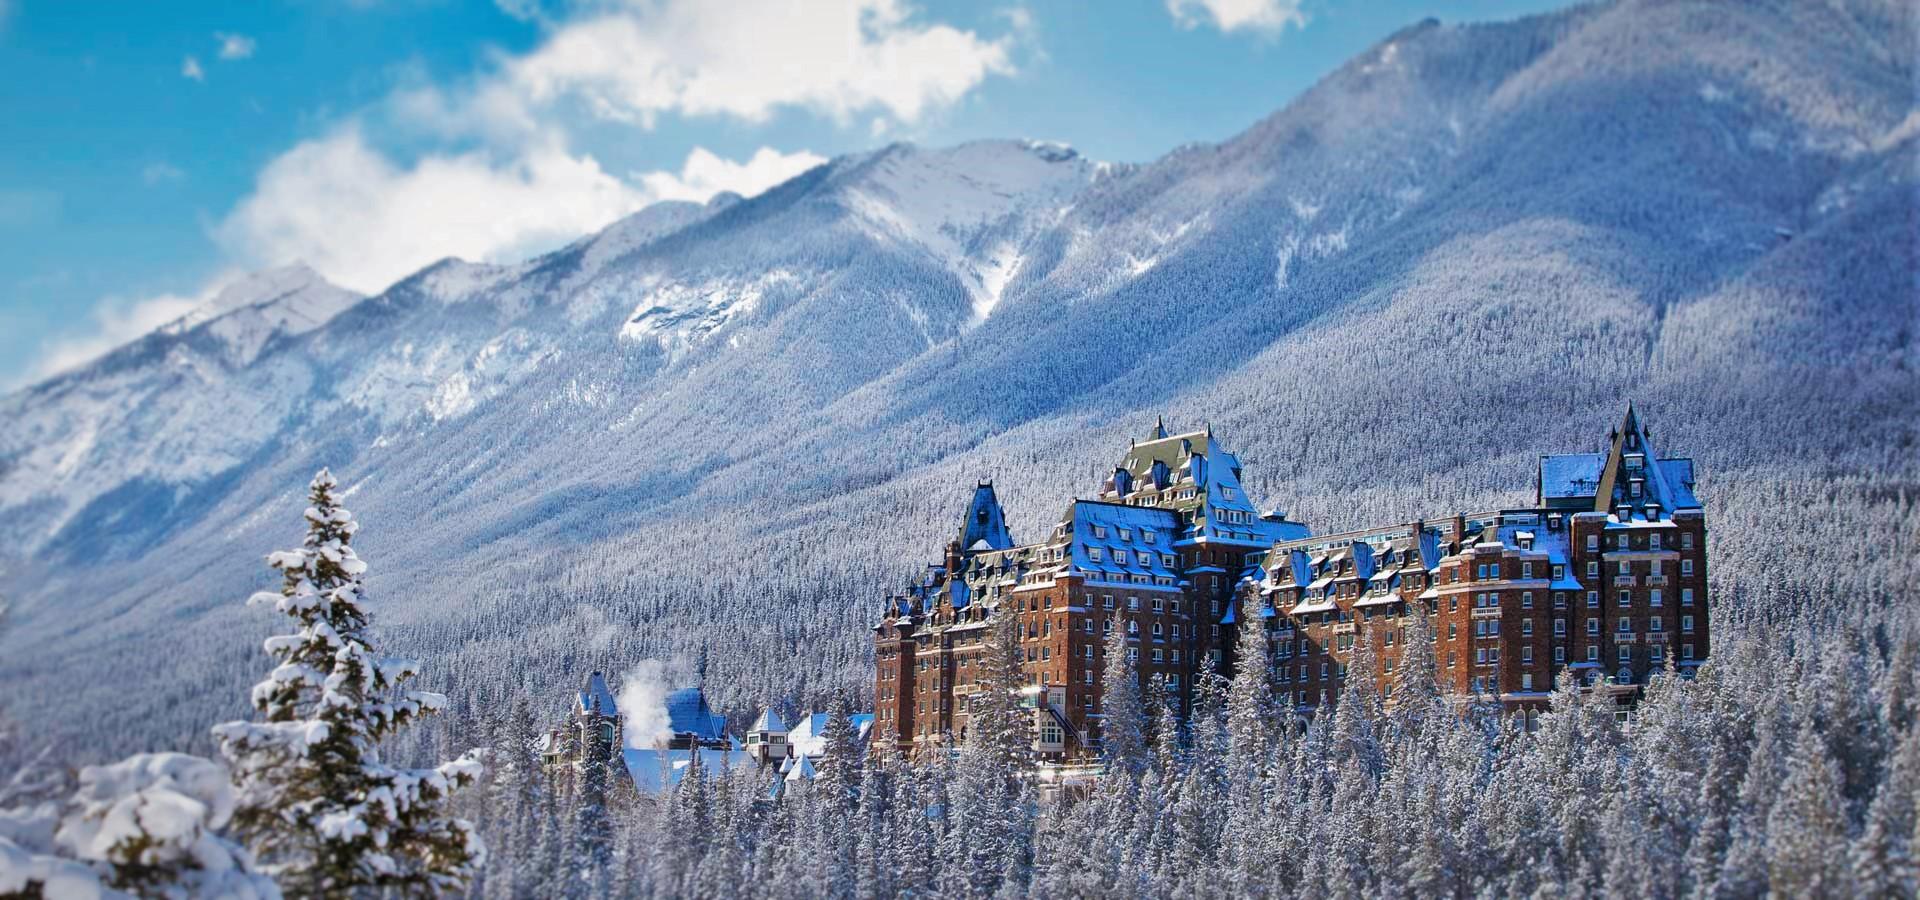 Best Canadian Cities To Treasure The Beautiful Winter Season